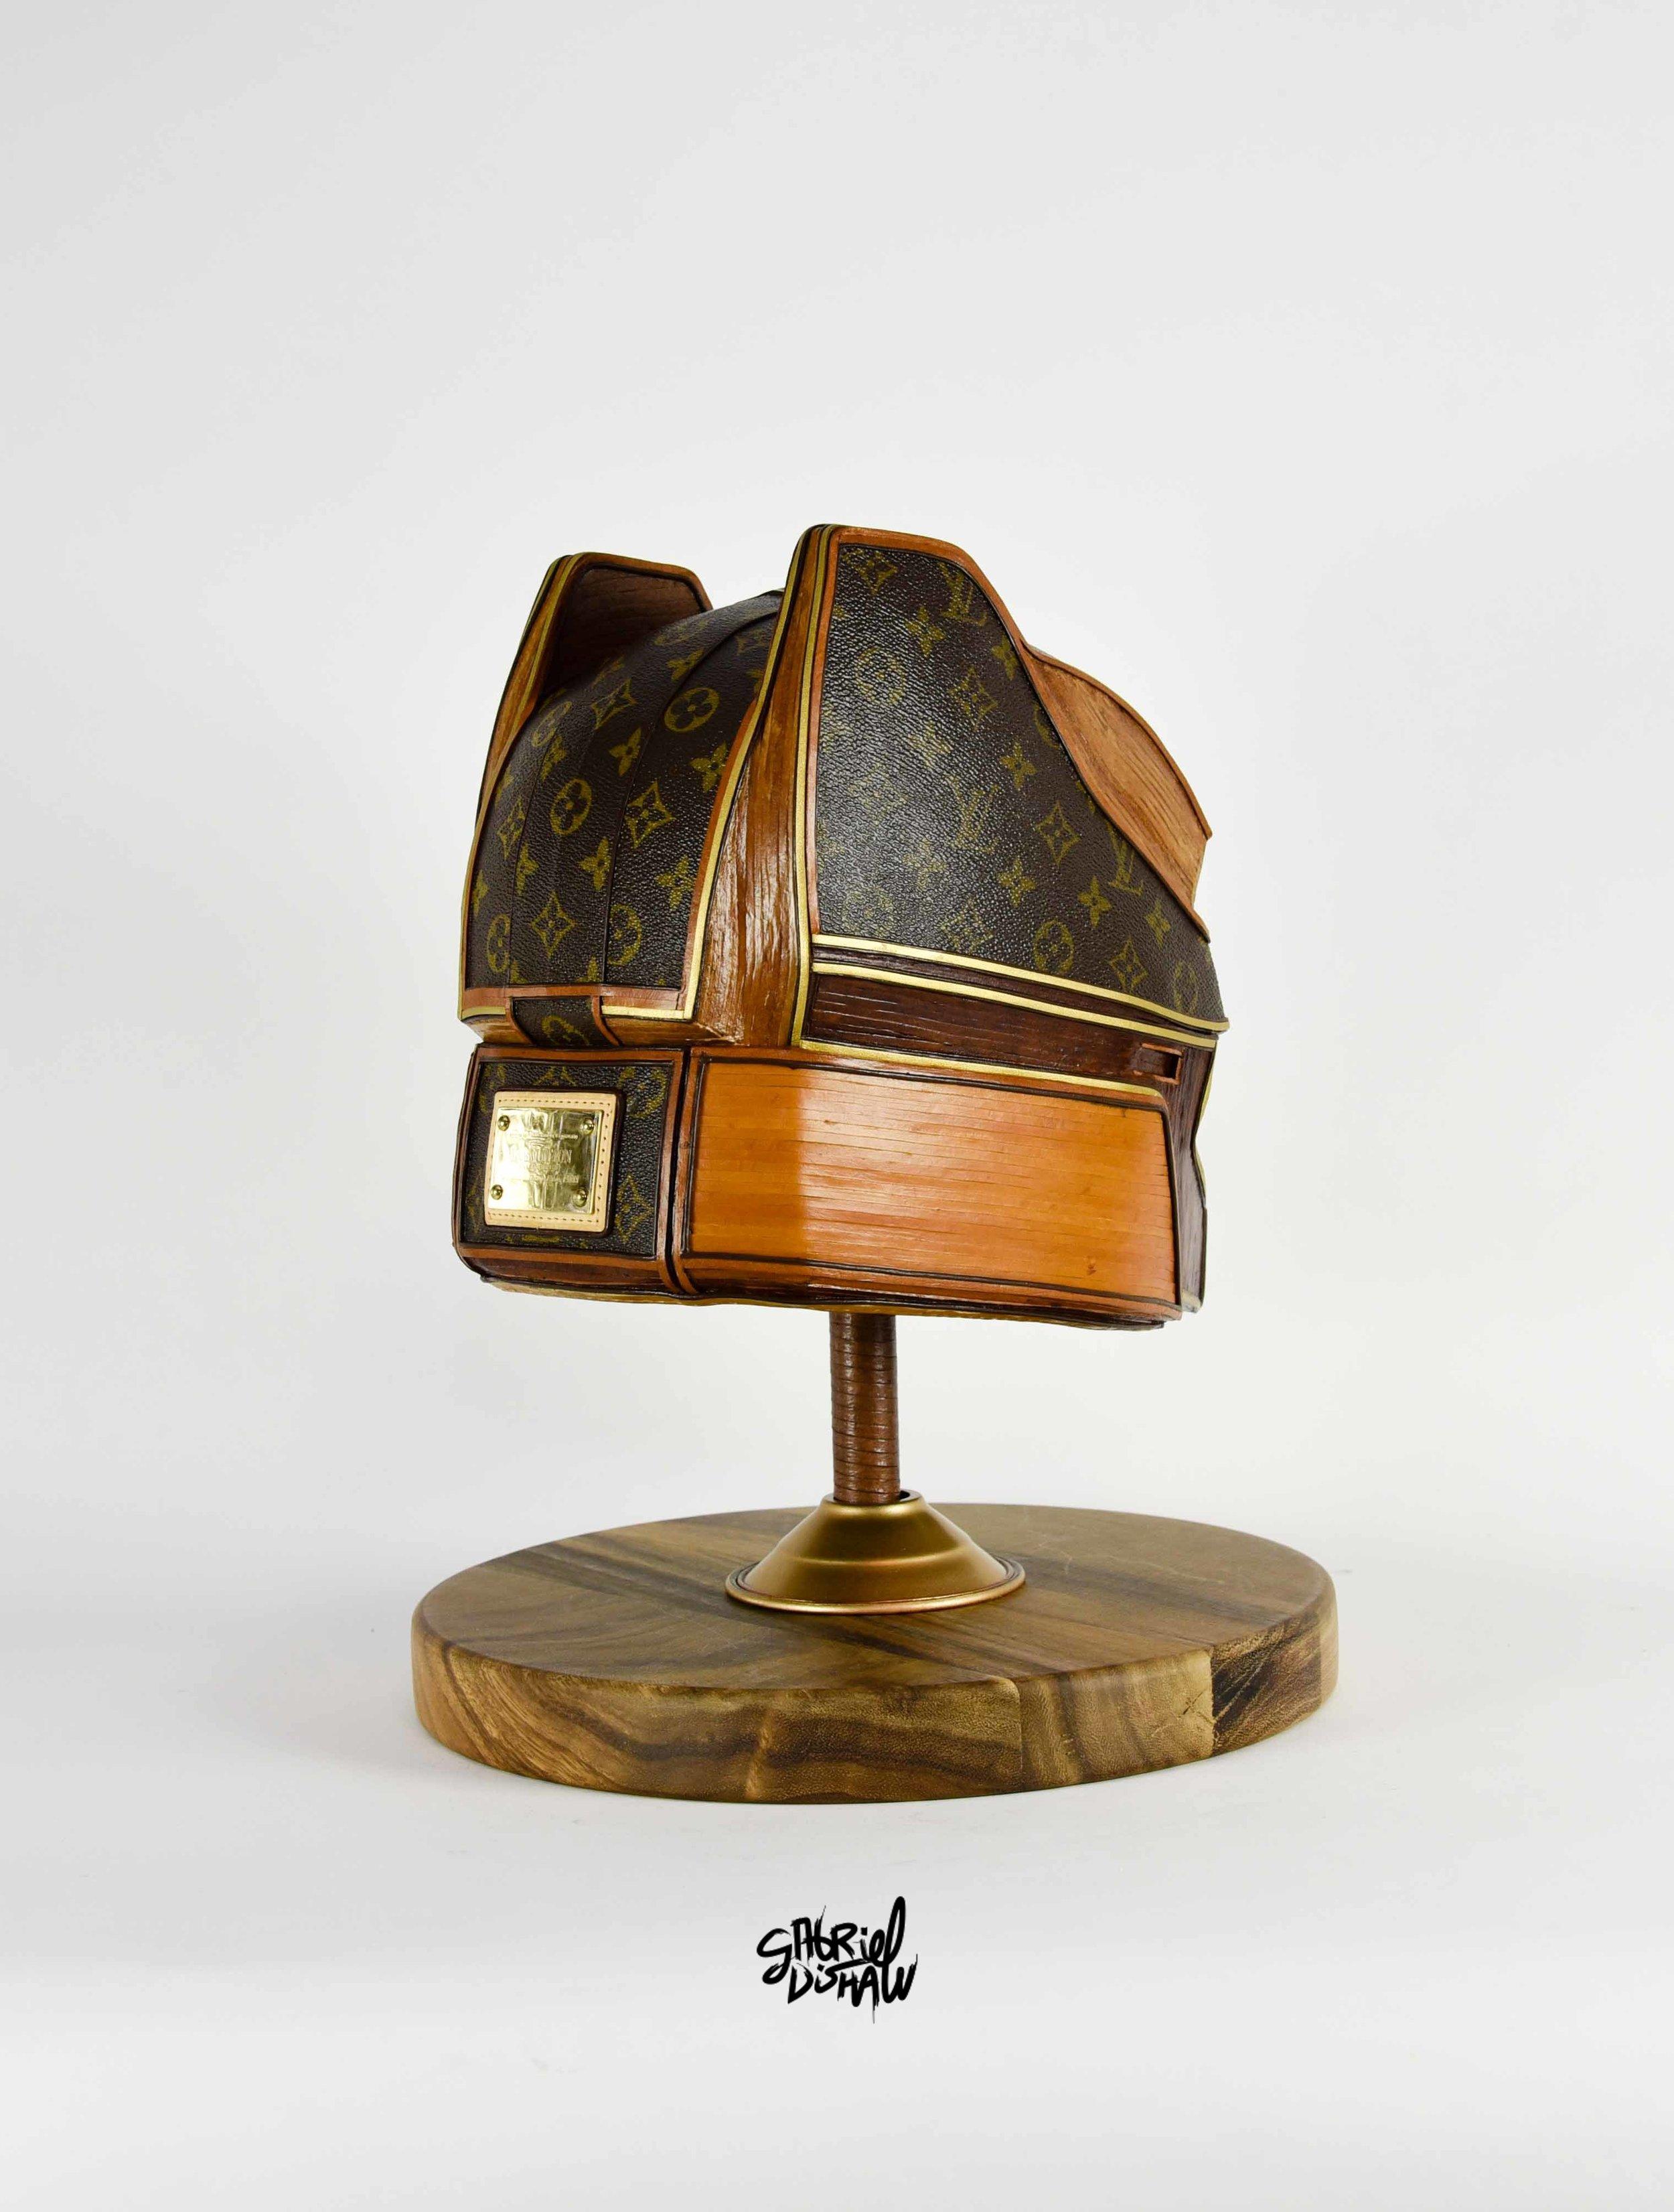 Gabriel Dishaw Vuitton Knight (132 of 164).jpg